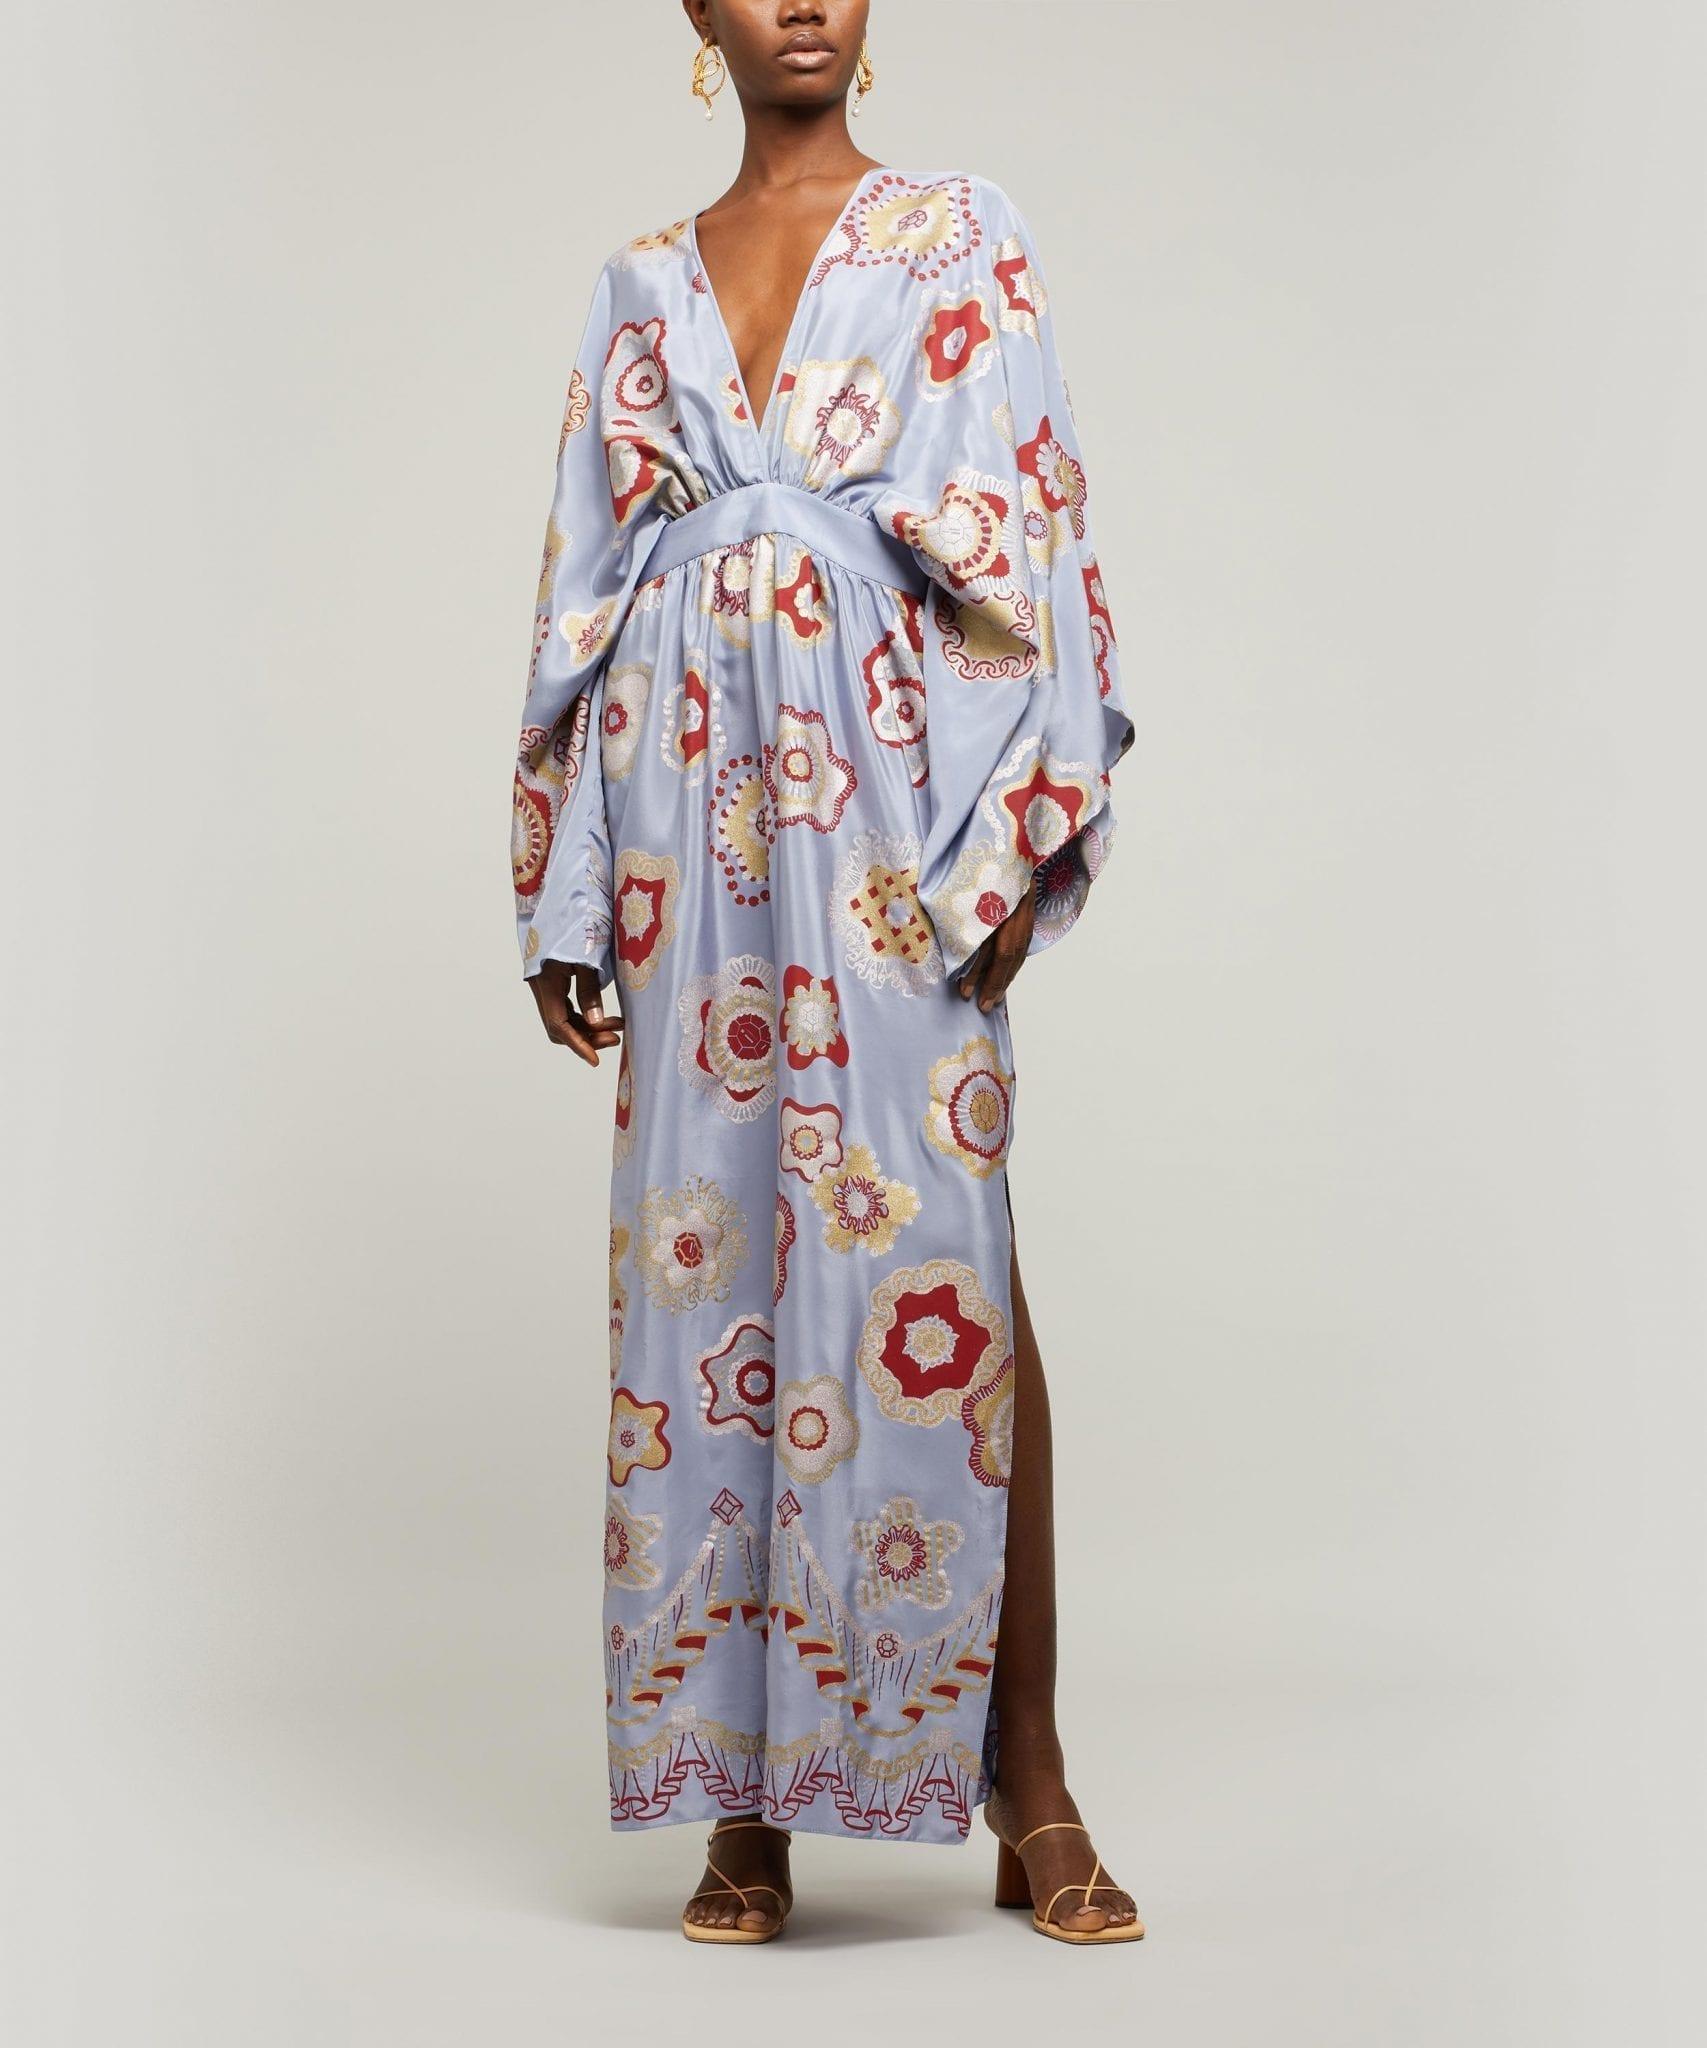 ZANDRA RHODES Jewel Flower Dress